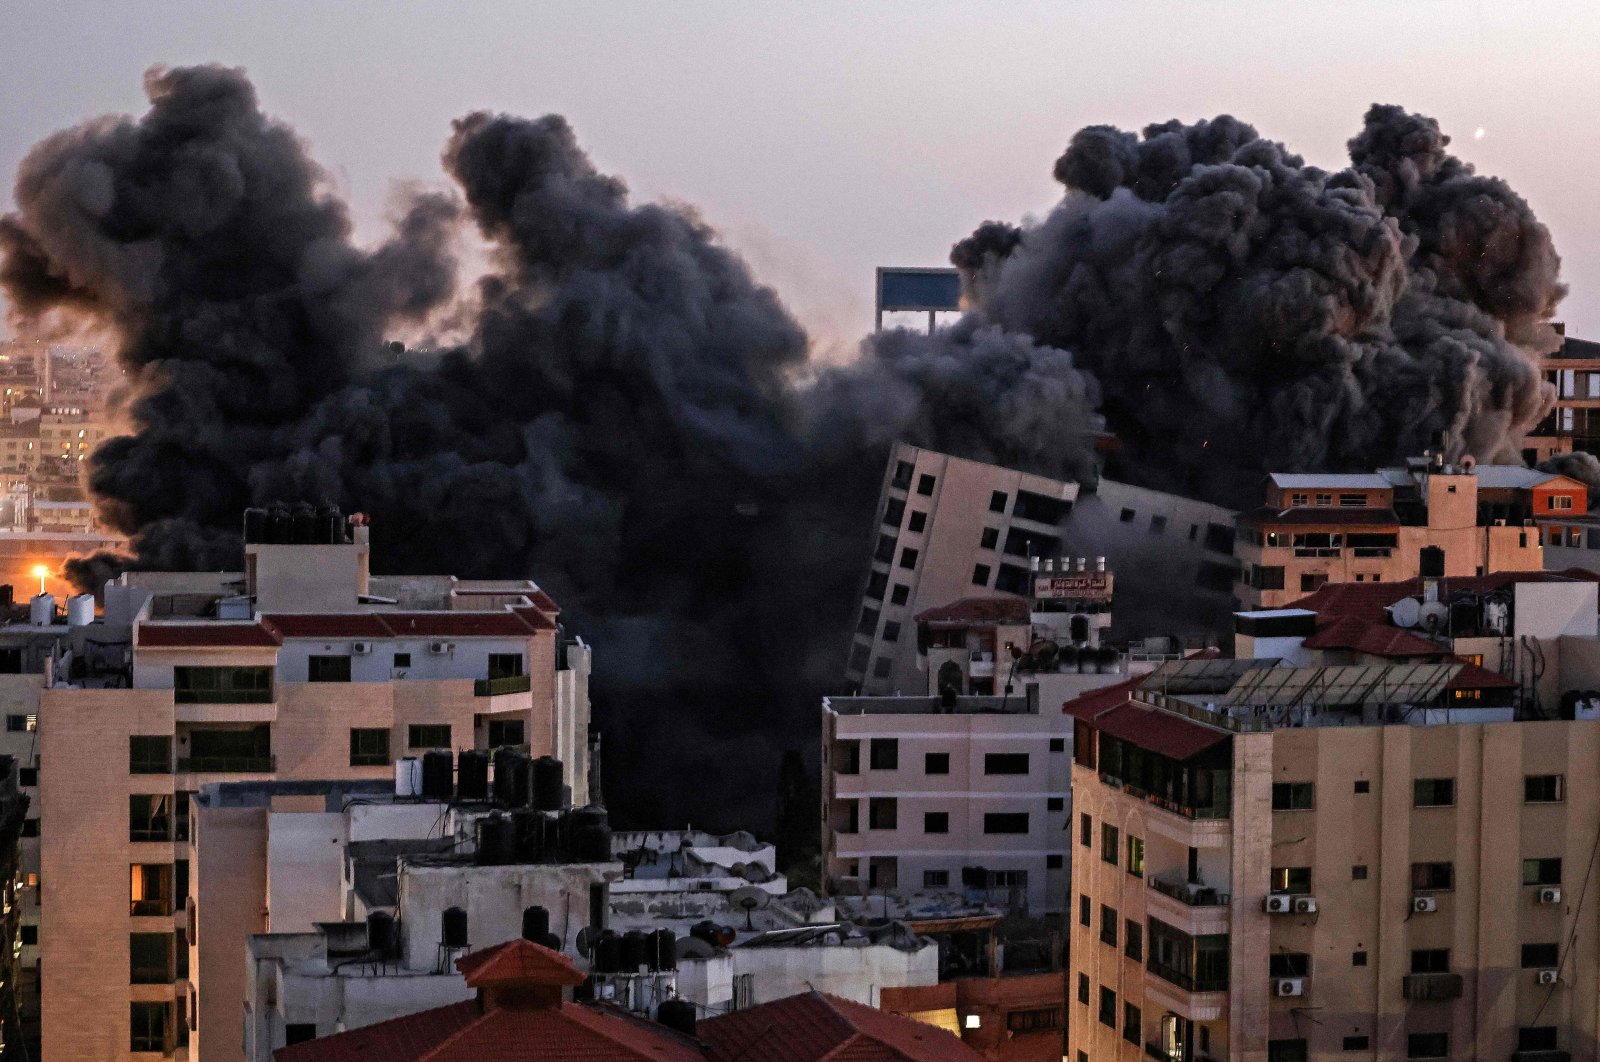 Smoke billows from an Israeli airstrike on the Hanadi compound in Gaza City, the Gaza Strip, Palestine, May 11, 2021. (AFP Photo)